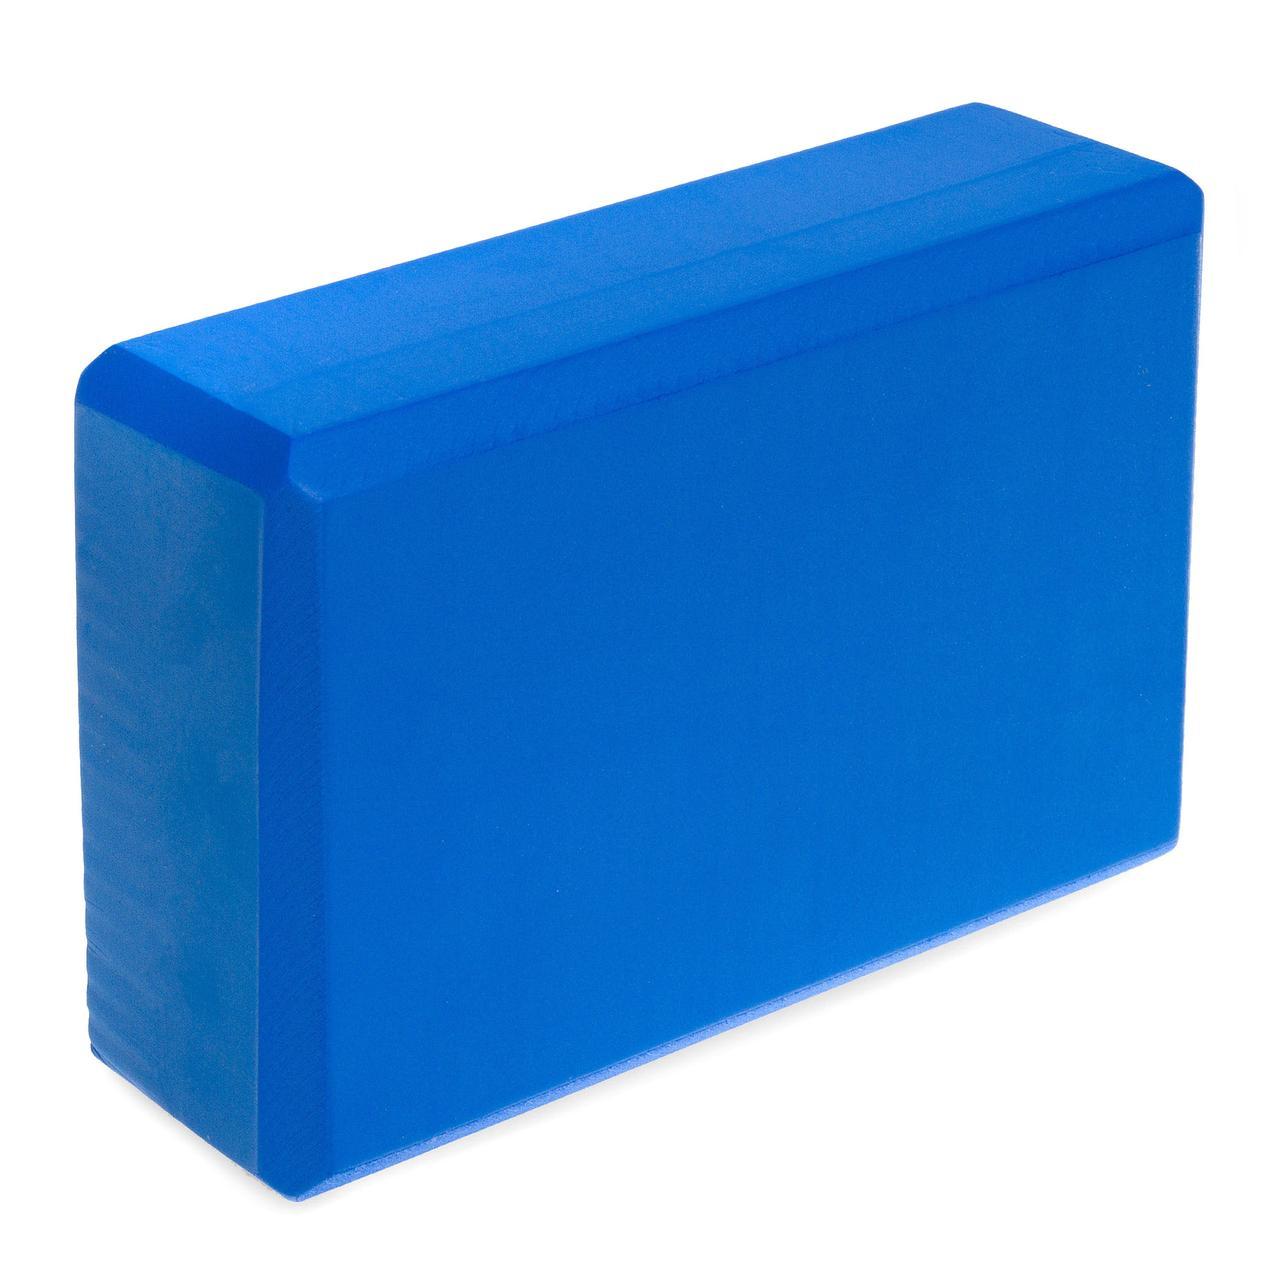 Йога-блок FI-1536 (EVA 100гр, р, 23 x 15 x 8см, синий)